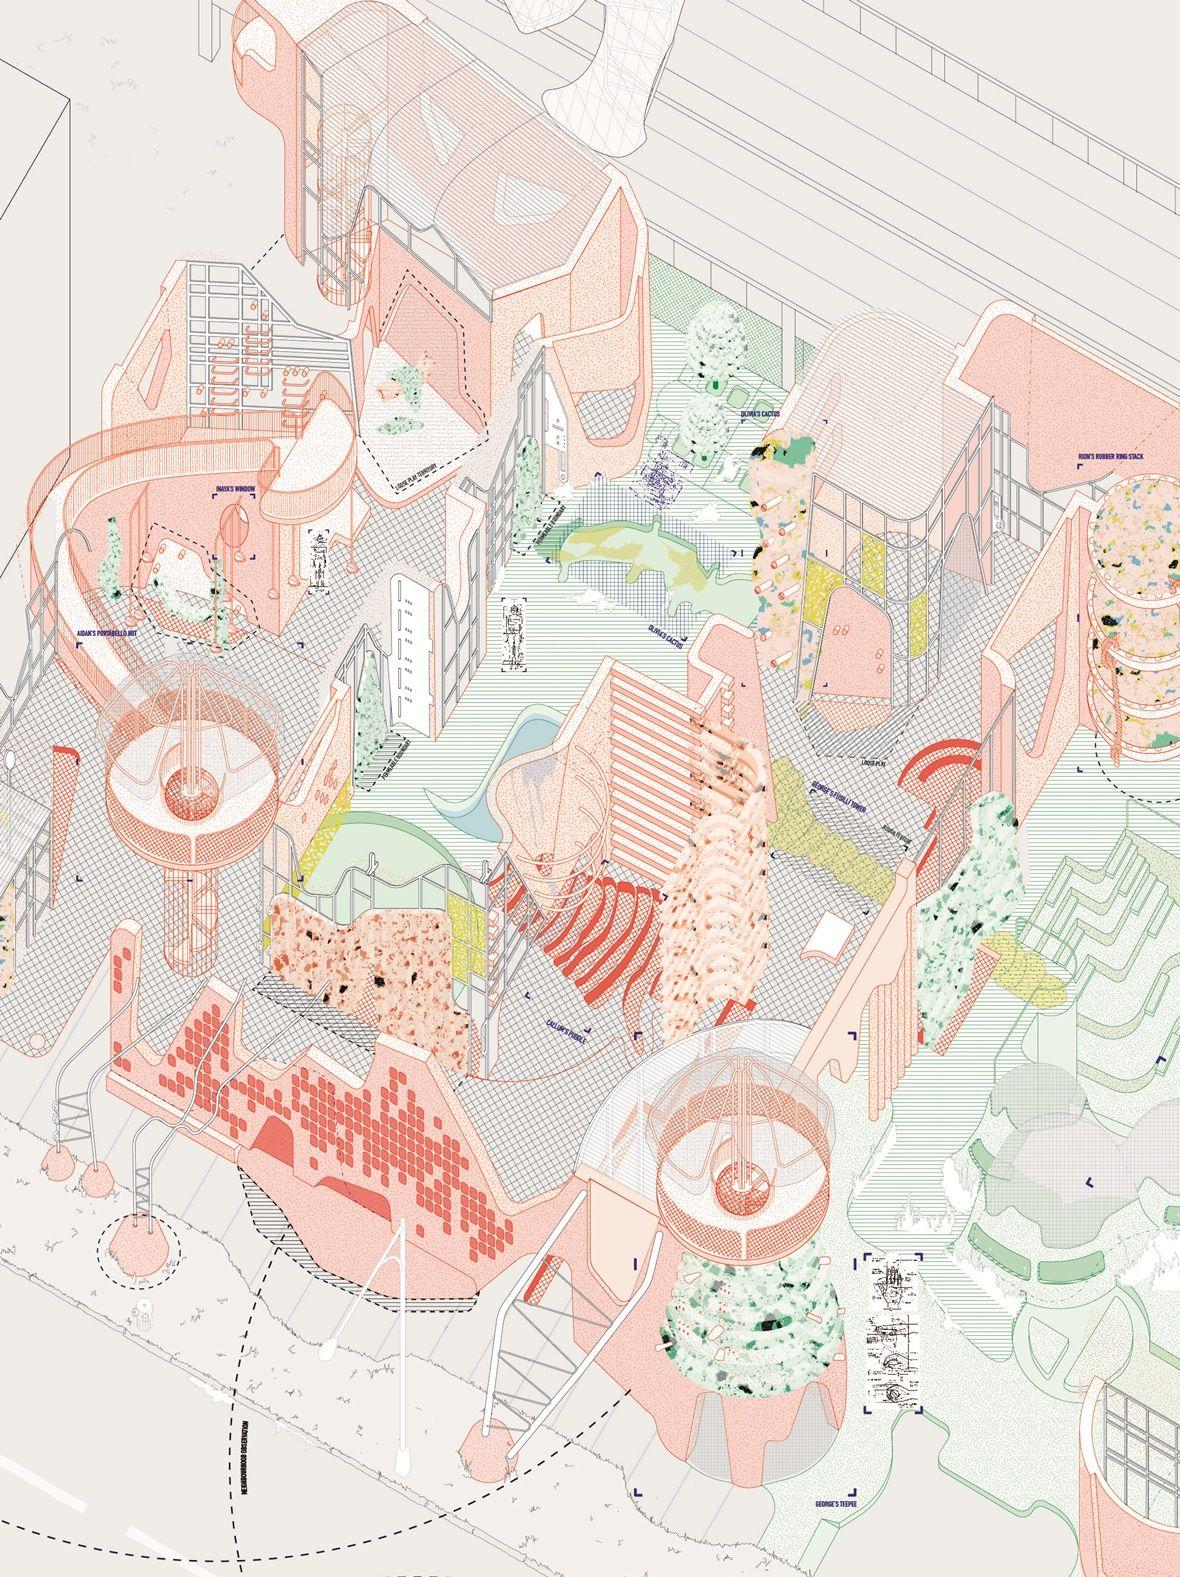 School garden design drawing - Axo Emma Kitley More School Architecturearchitecture Drawingsaxonometric